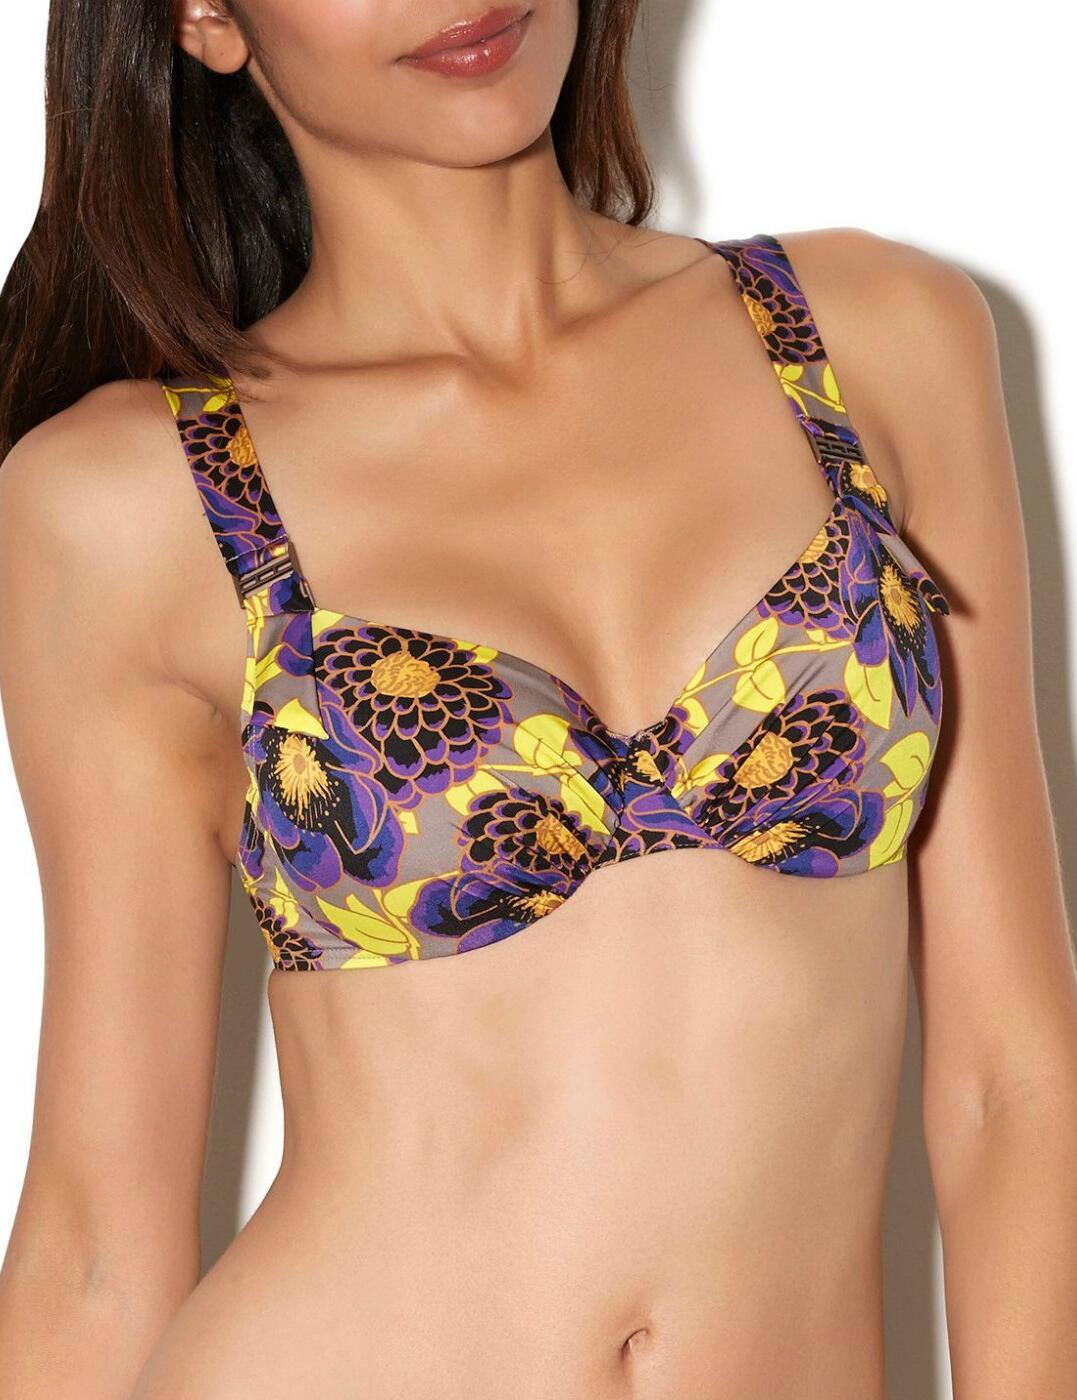 AJ15 Aubade Songe Tropical 3/4 Cup Bikini Top - AJ15 Granite